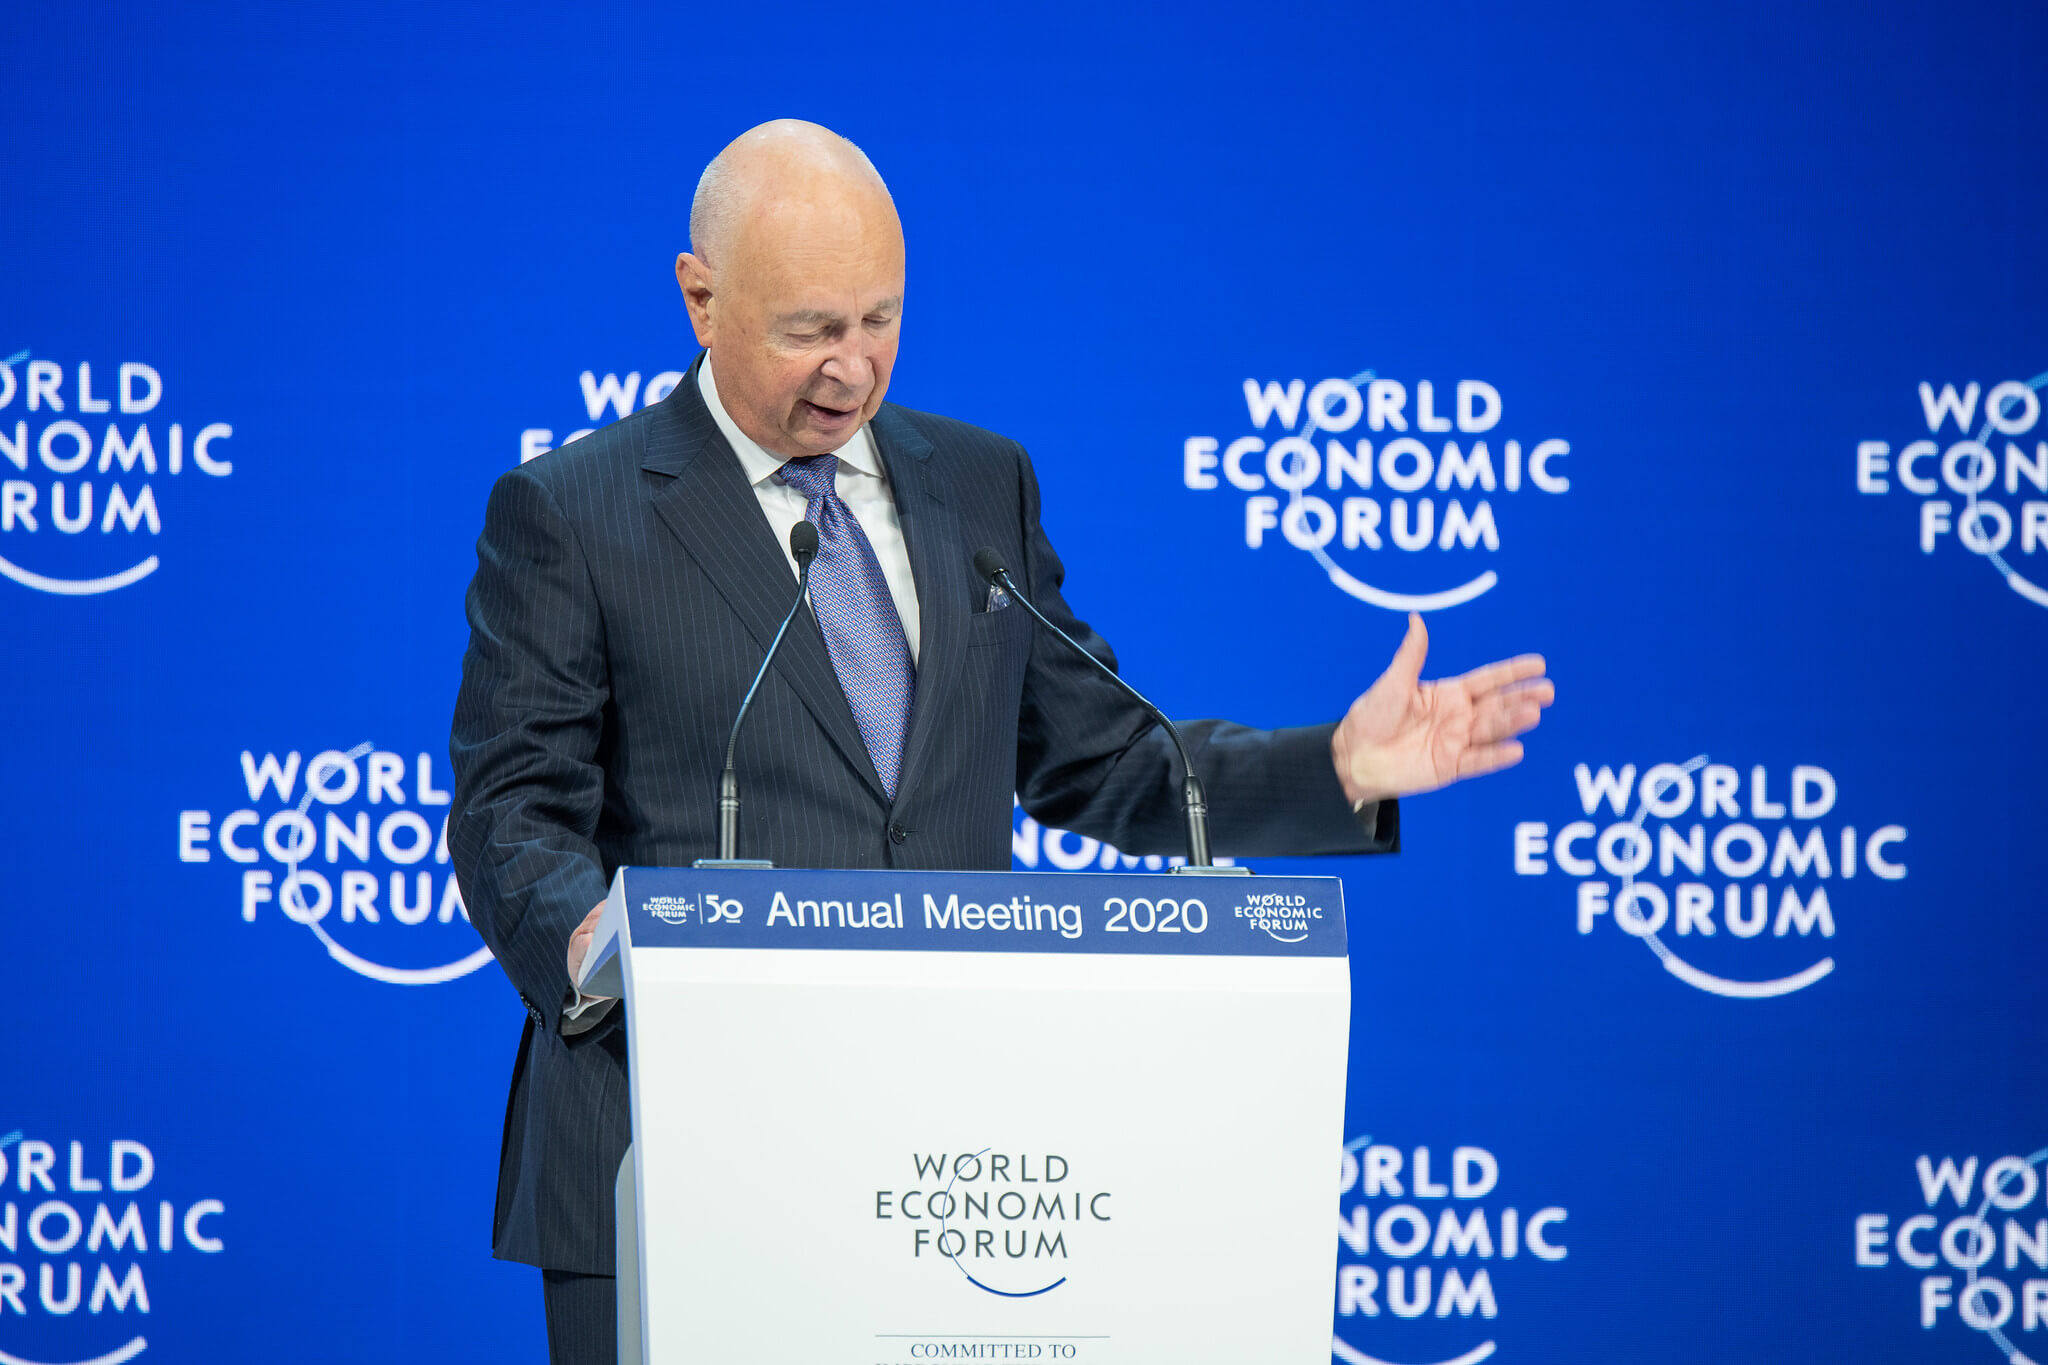 DeWit-Klaus Schwab speaking at World Economic Forum Annual Meeting, 22Jan2020-WEF-Boris Baldinger-Flickr